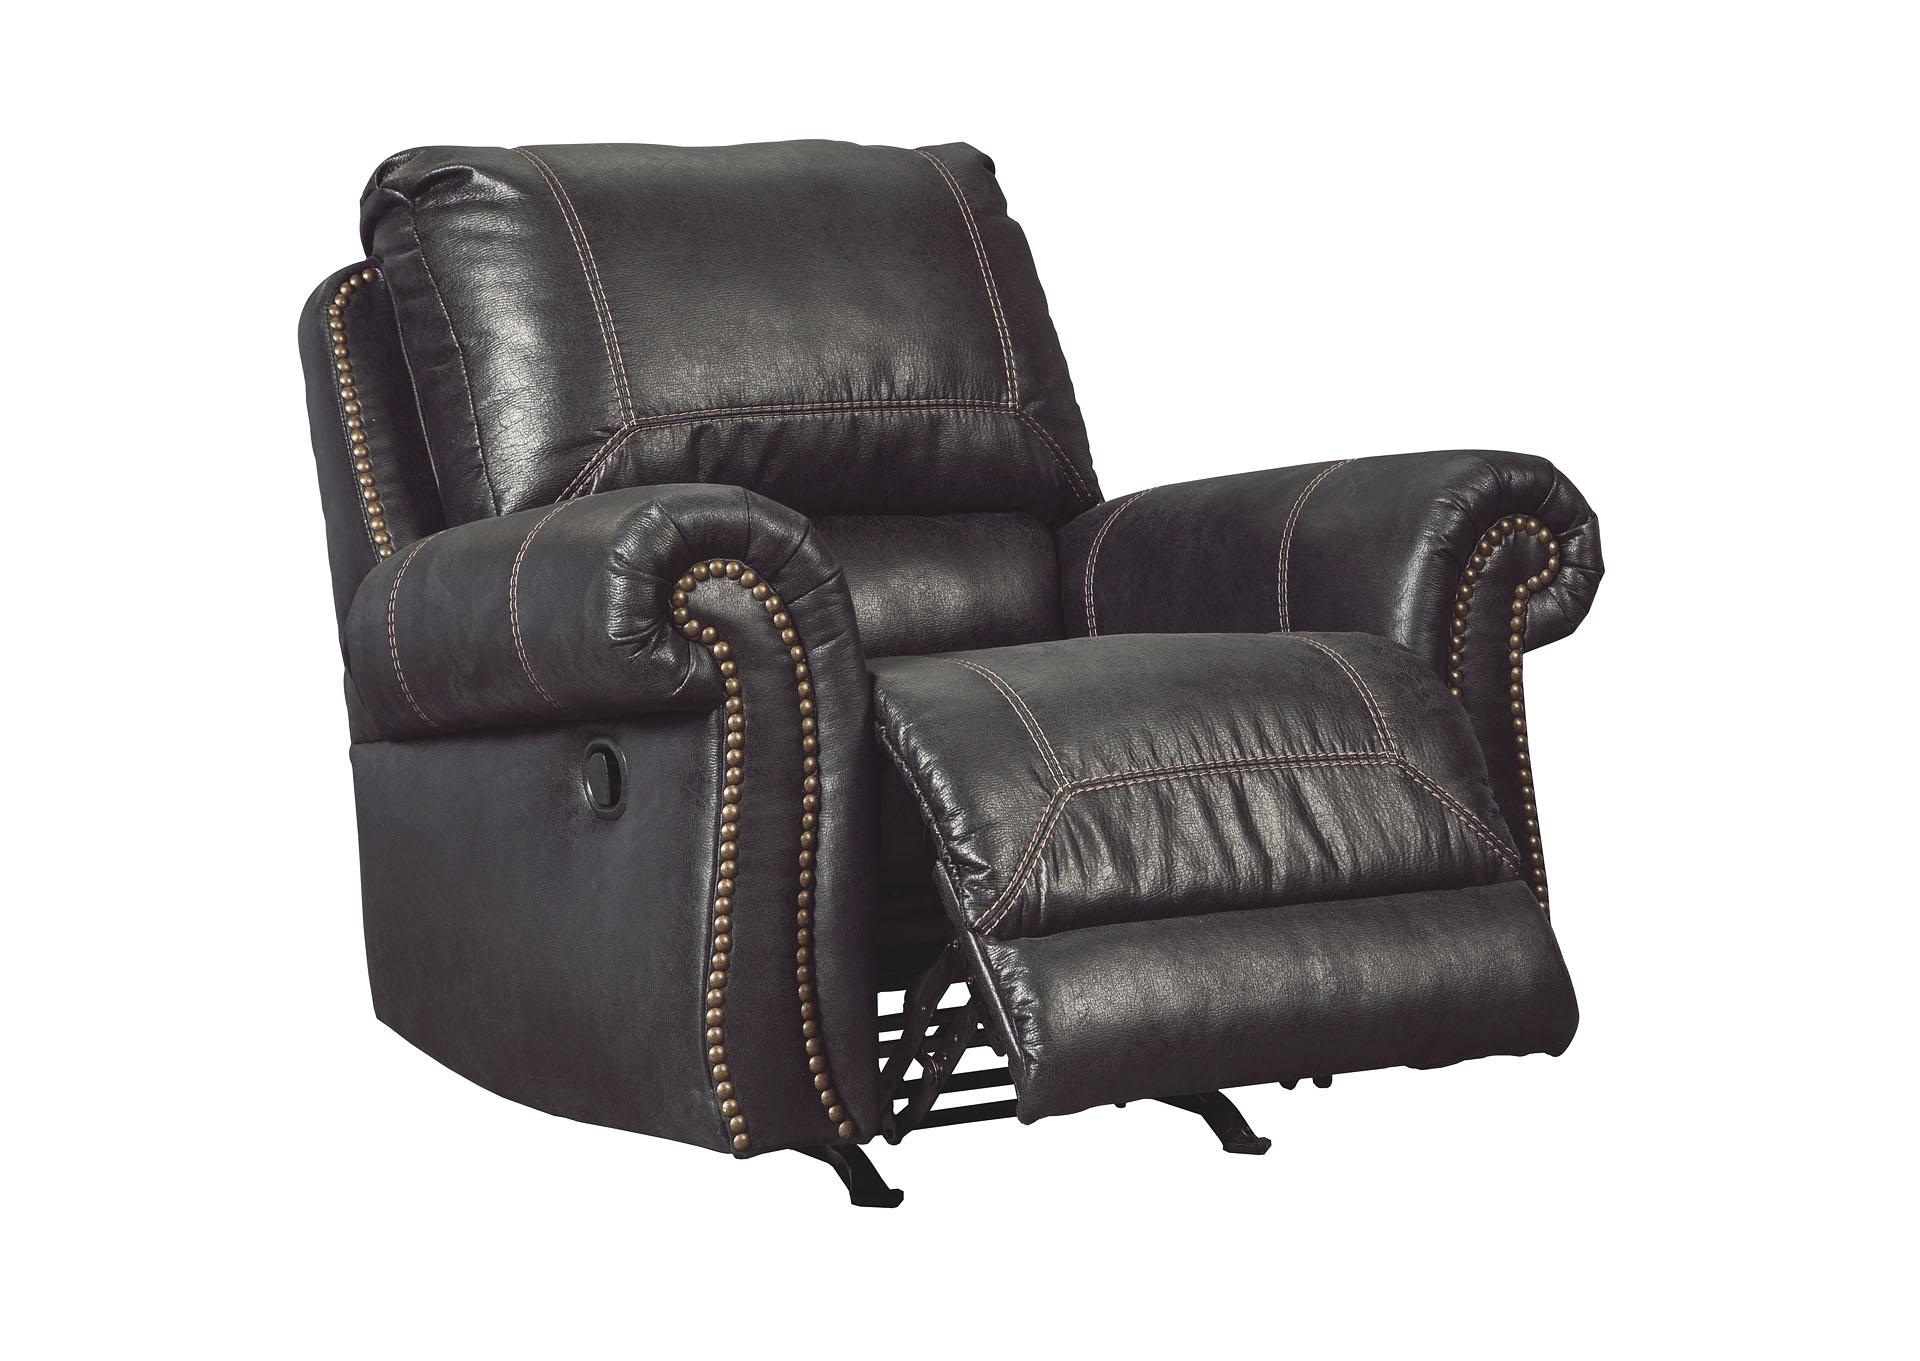 Muranou0026#39;s Furniture : Staten Island, NY Milhaven Black Rocker Recliner